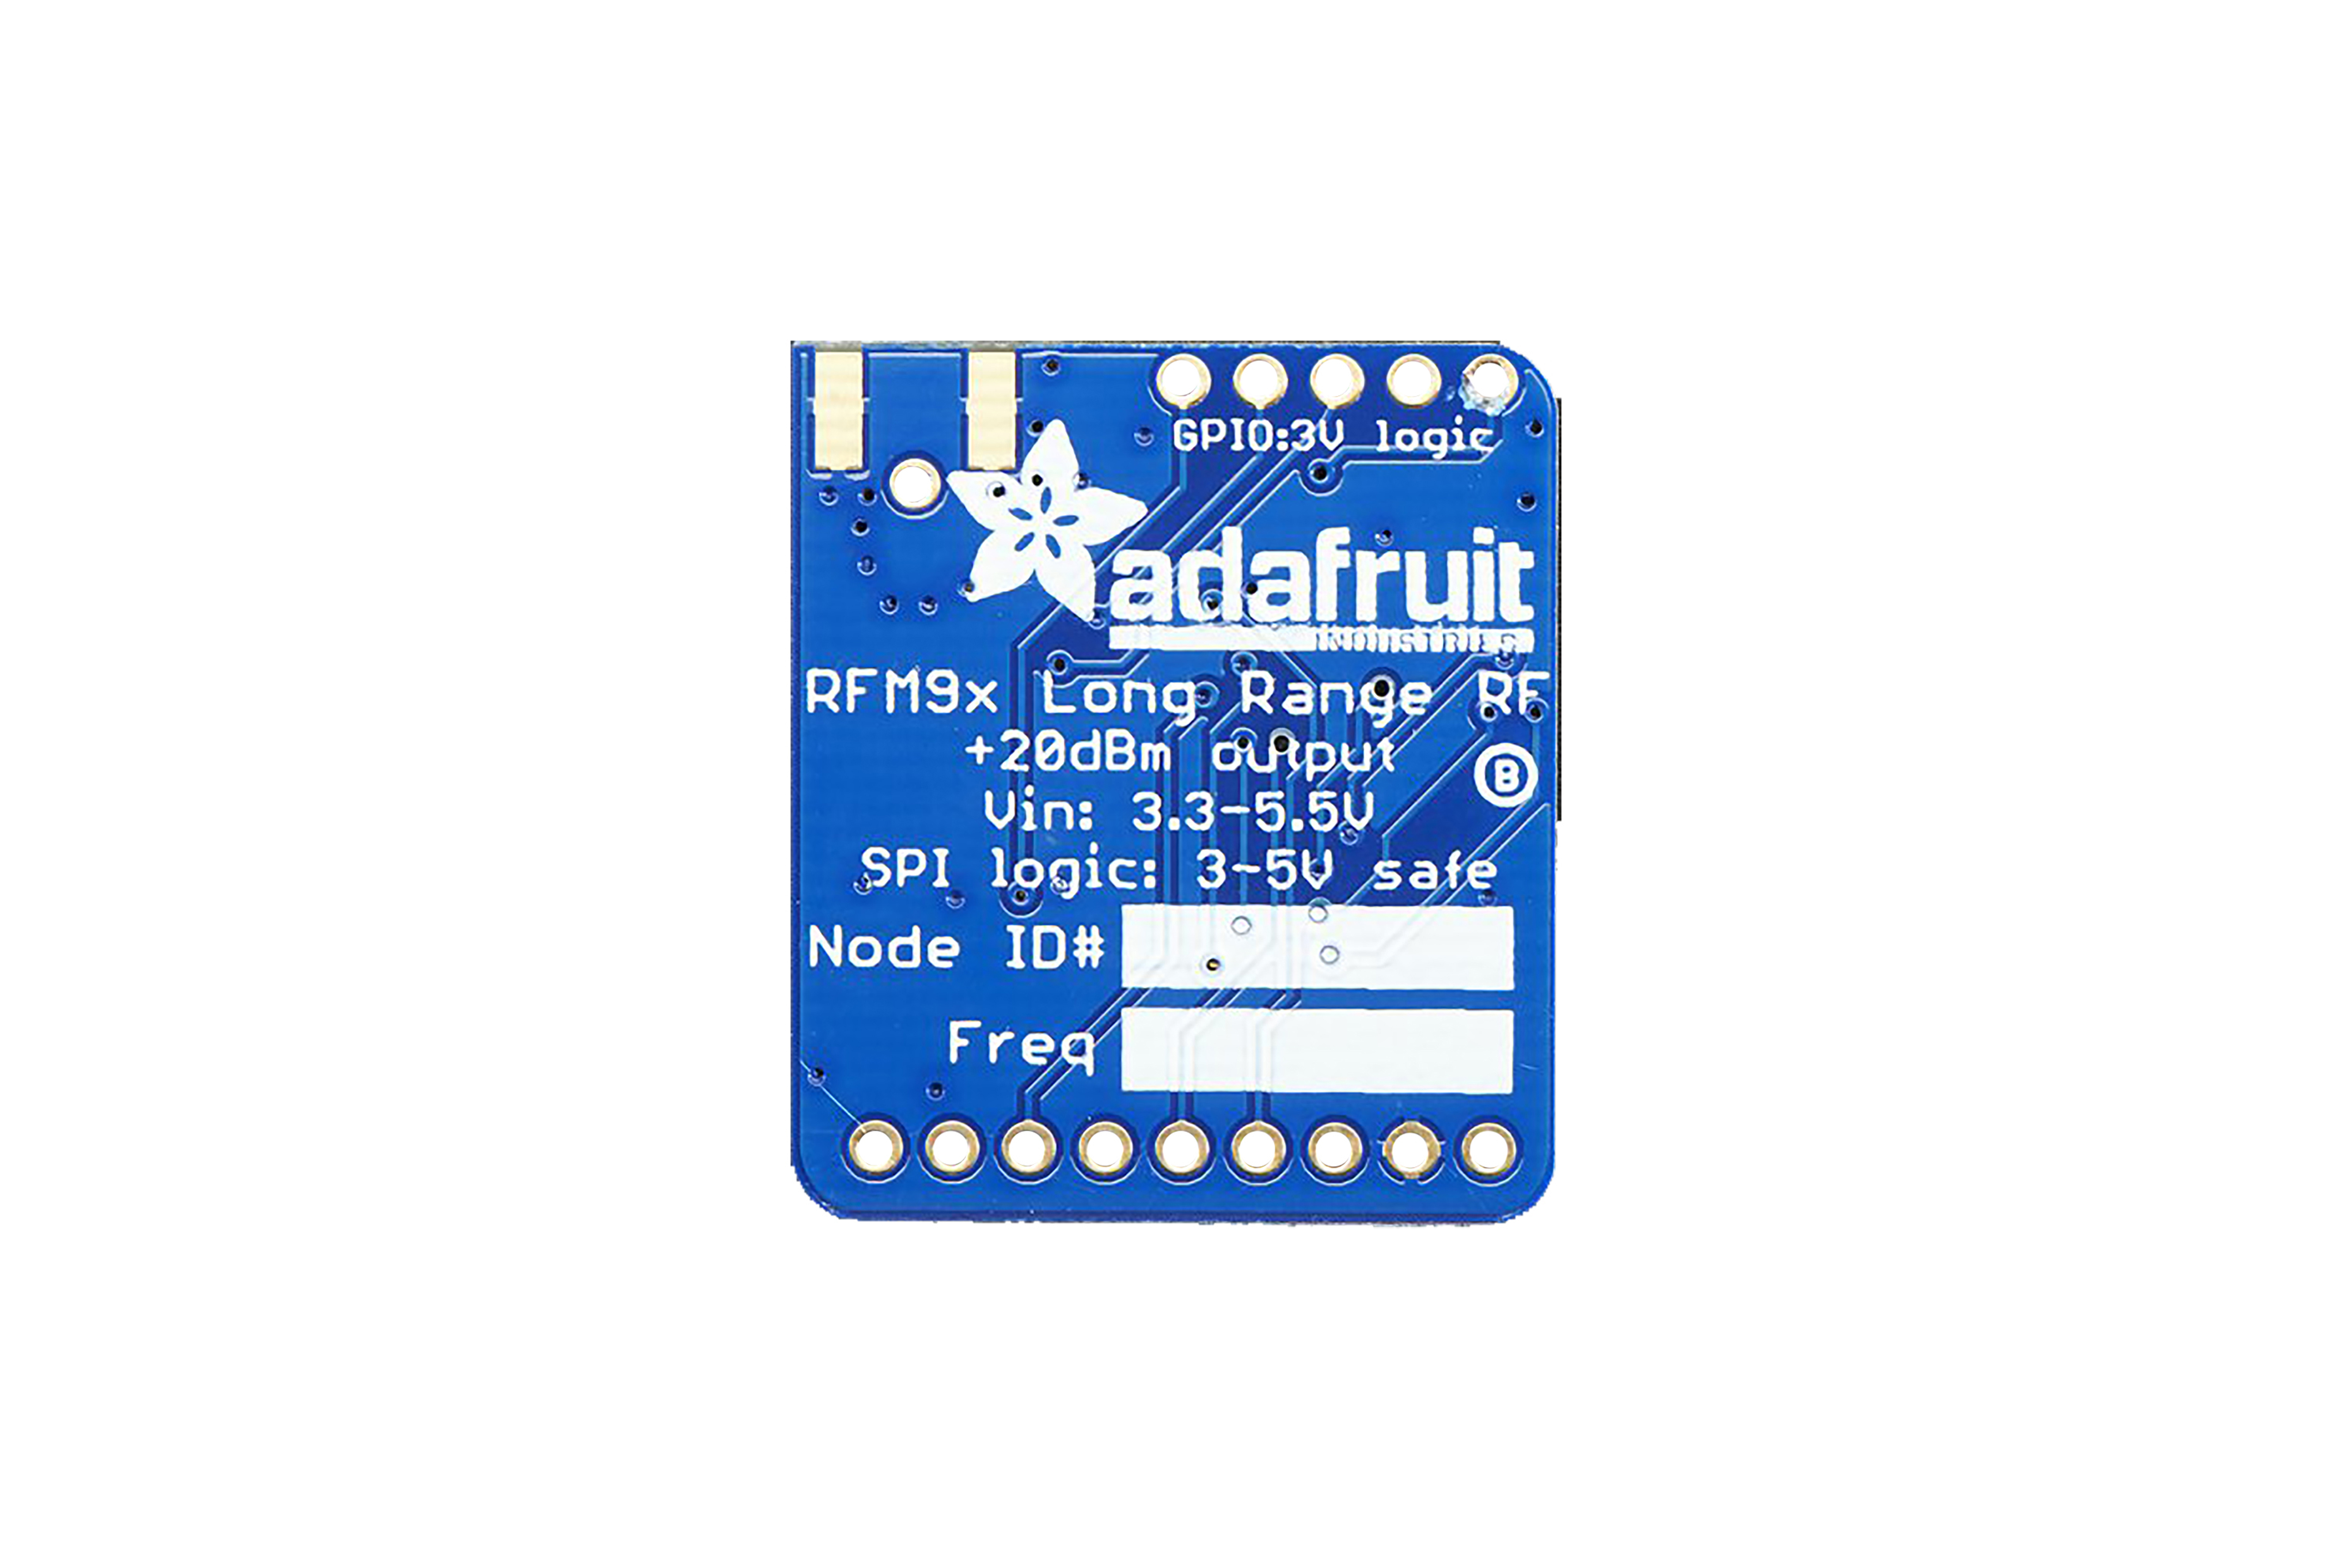 Adafruit Rfm96W LoRa Radio Transceiver Breakout - 433 Mhz - 3073